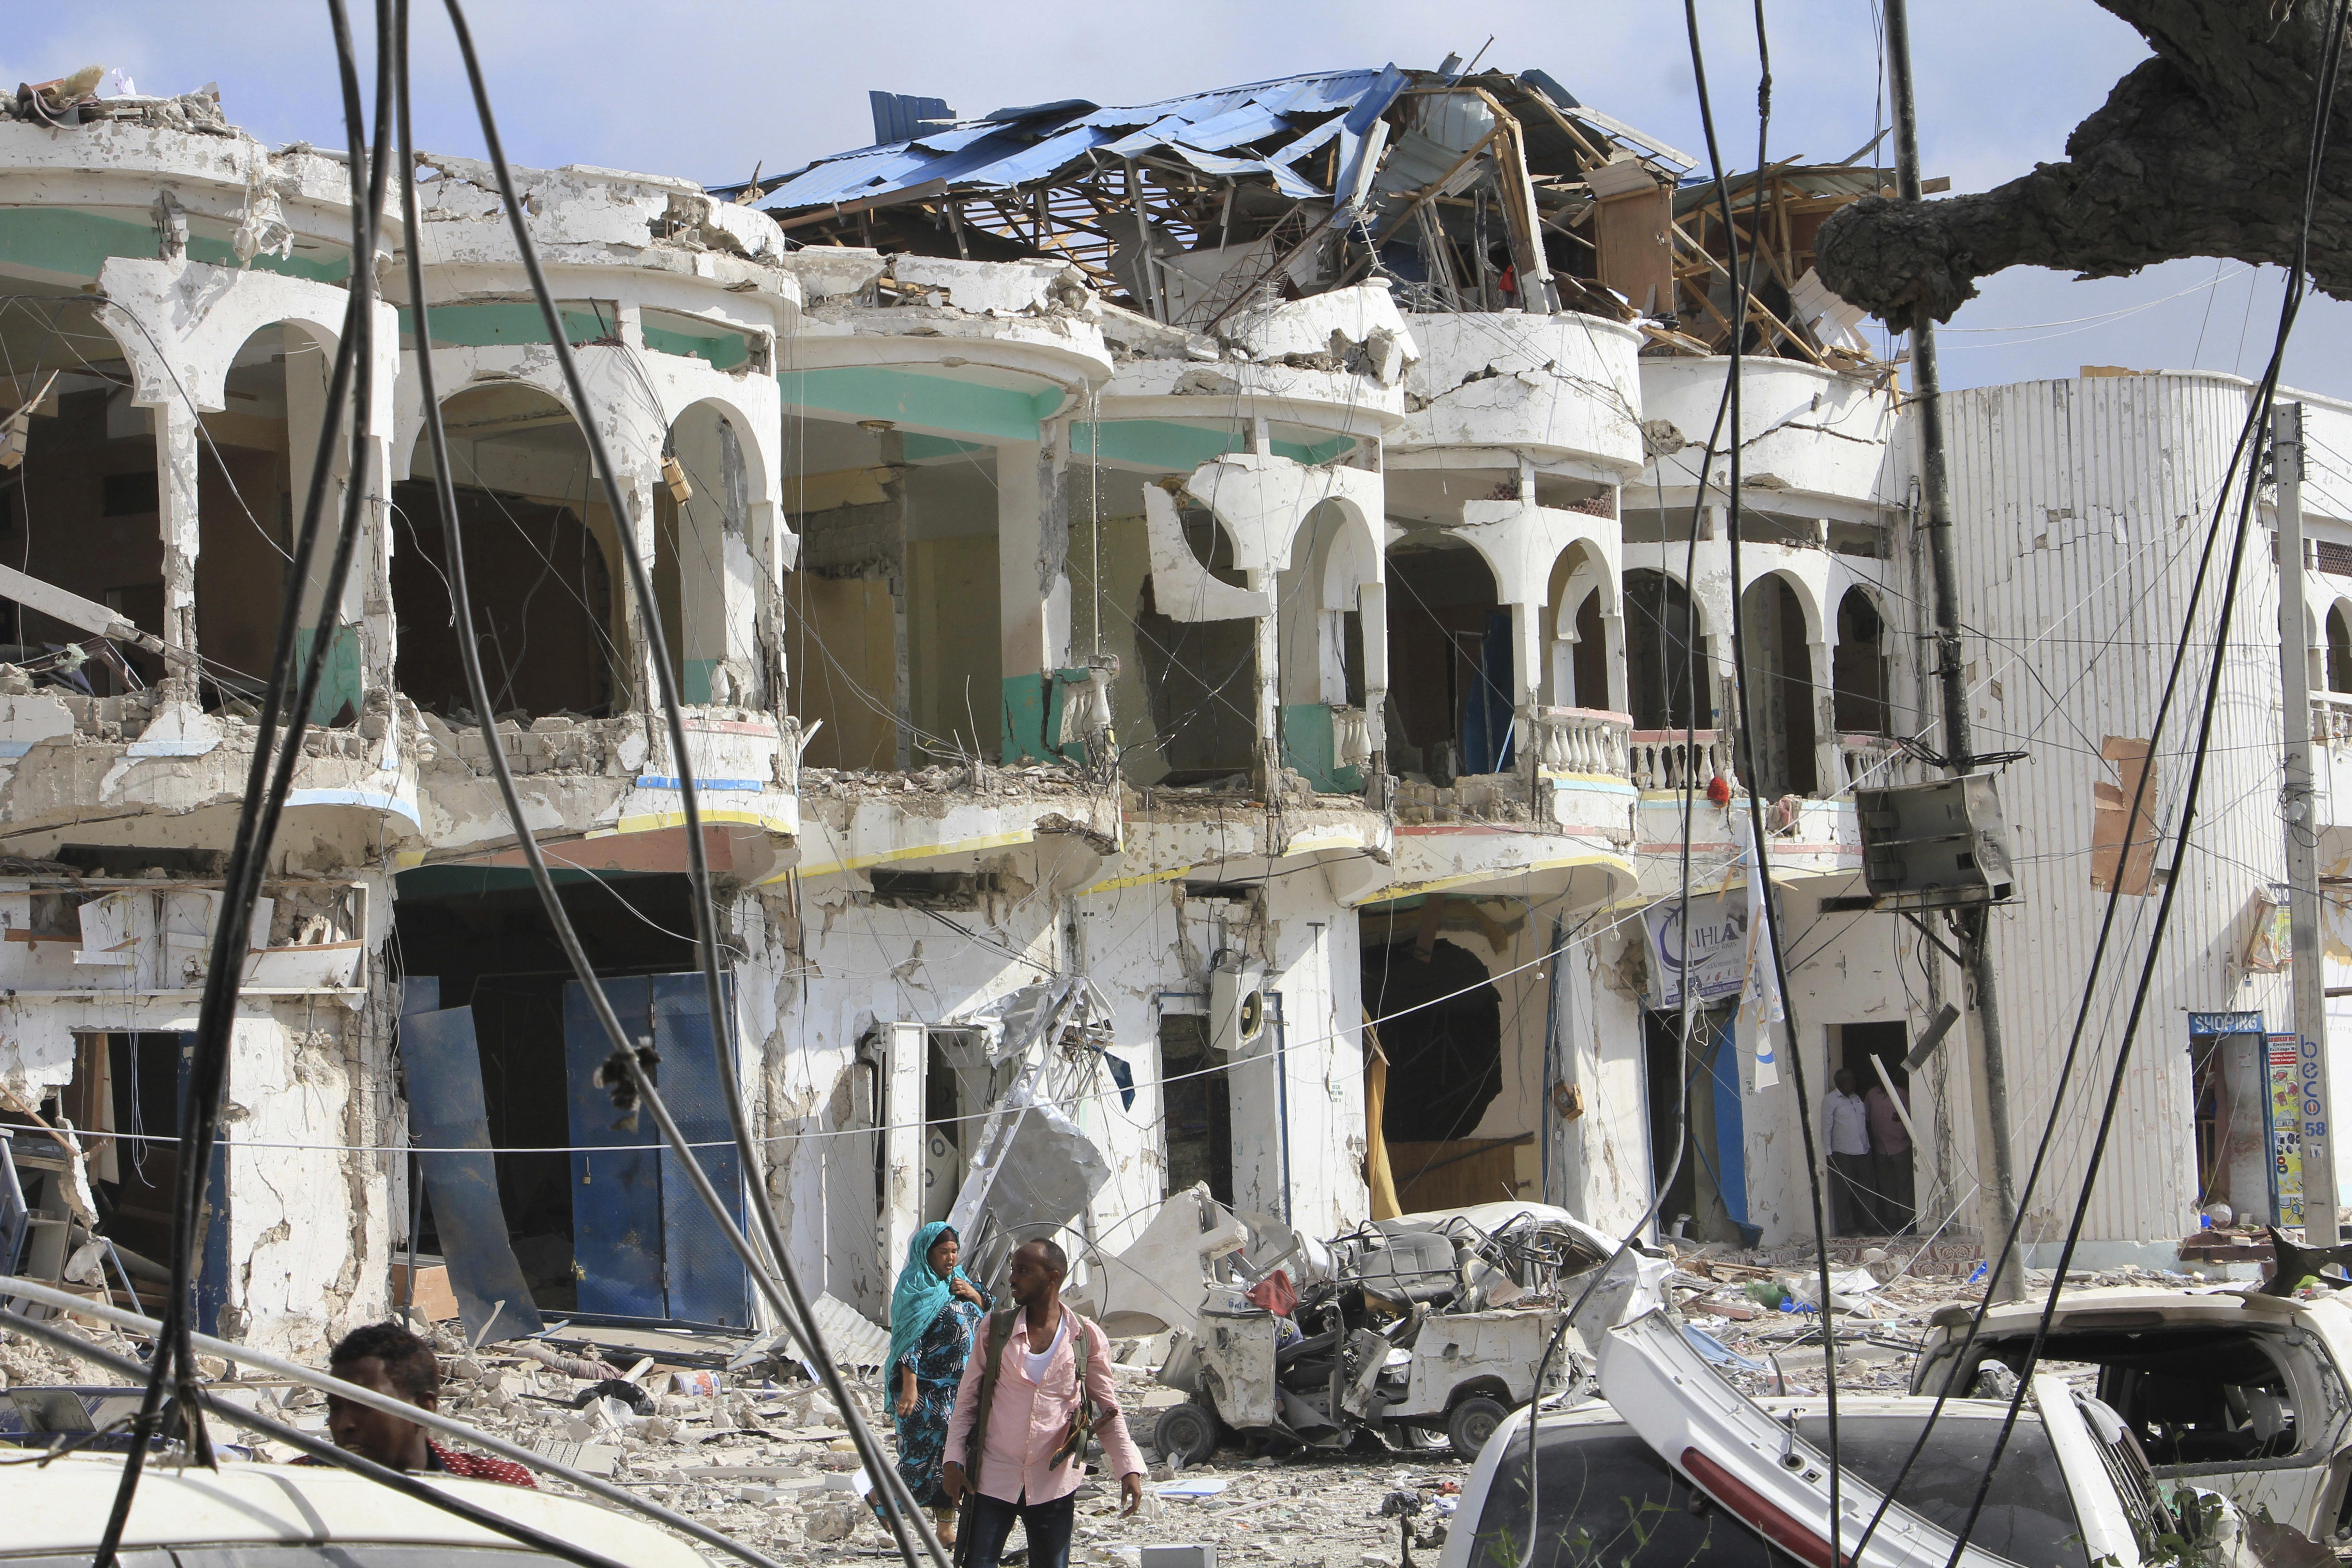 Somalis walk near a hotel heavily damaged by a car bomb blast in Mogadishu, Somalia on Jan 25, 2017. (AP Photo/Farah Abdi Warsameh)